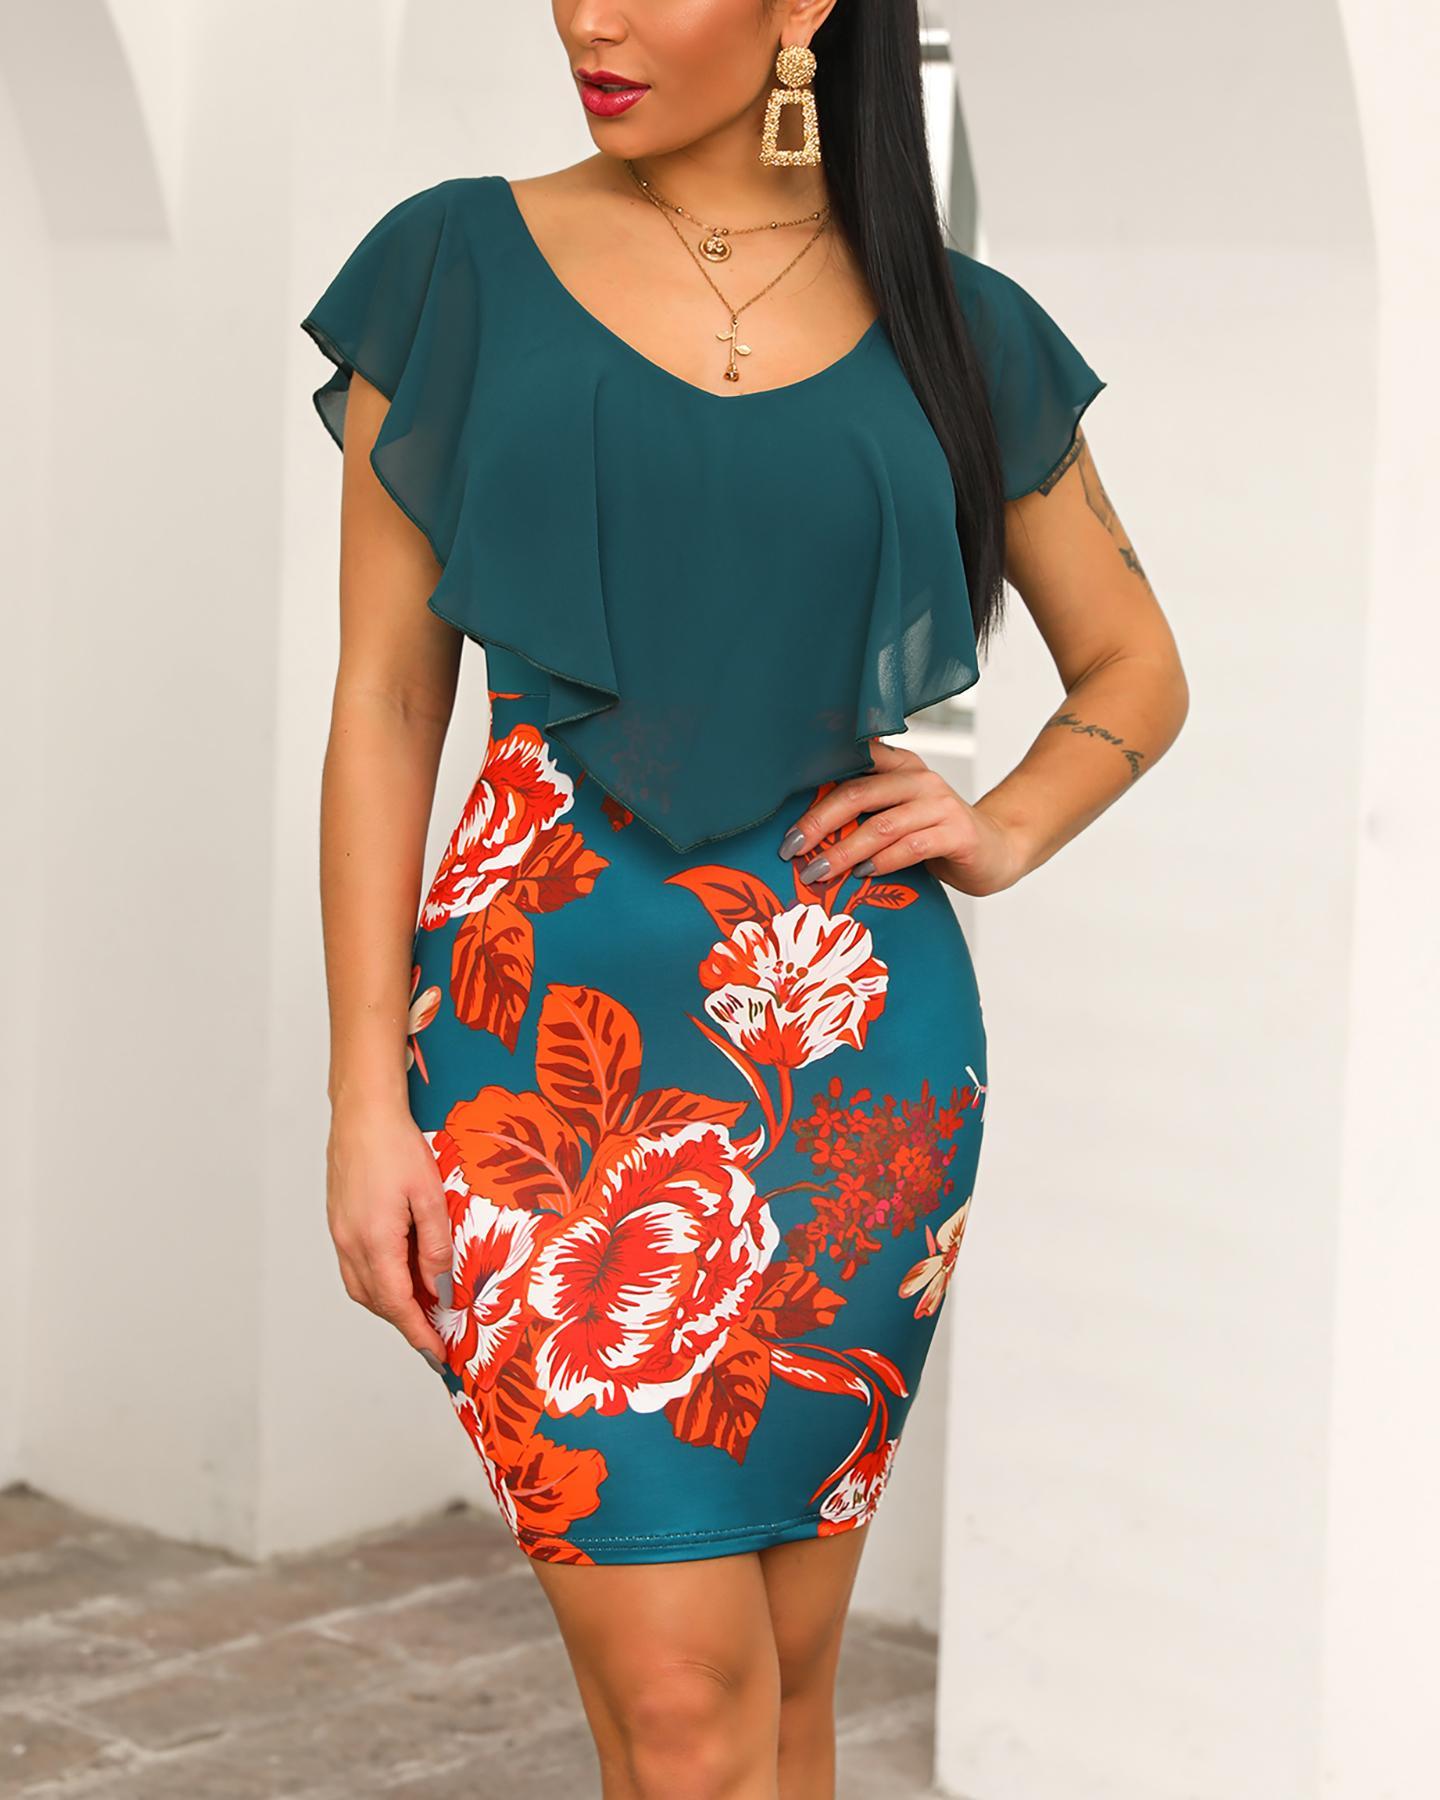 Floral Print Ruffles Design Bodycon Dress